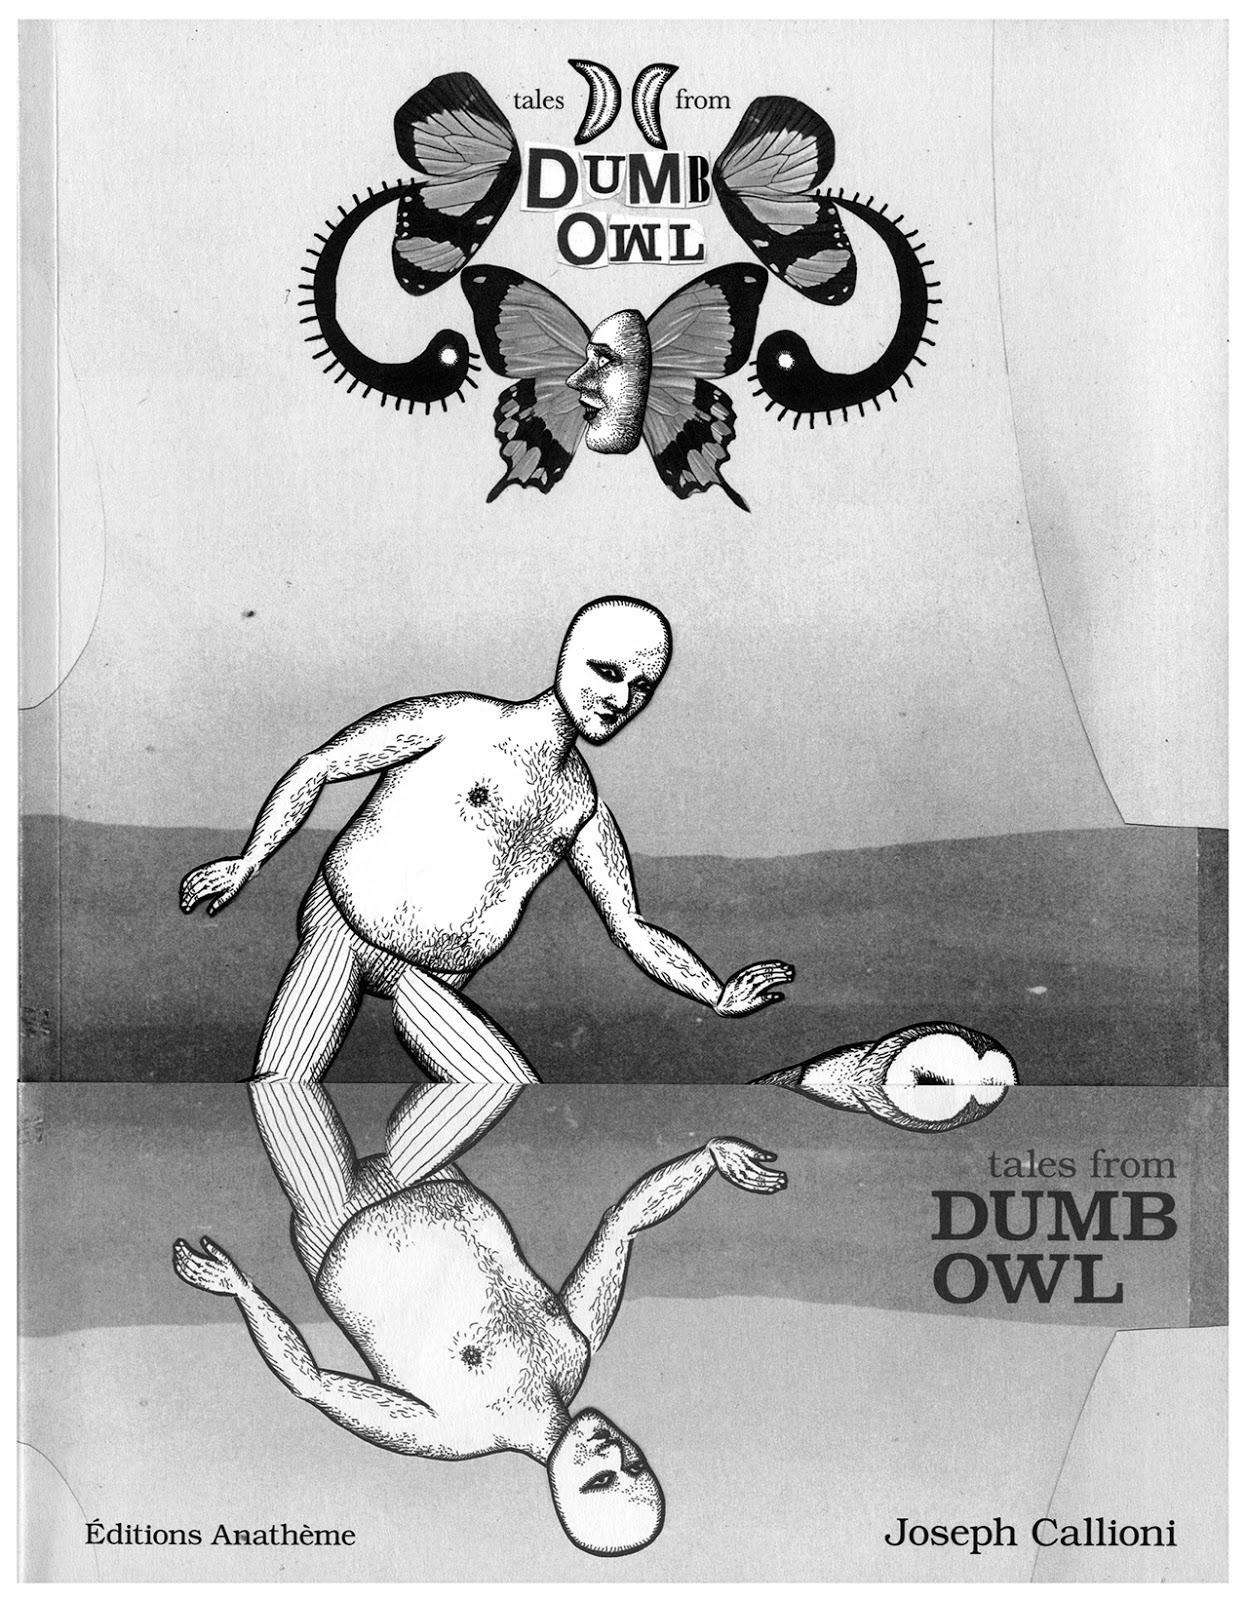 Dumb Owl - Joseph Callioni